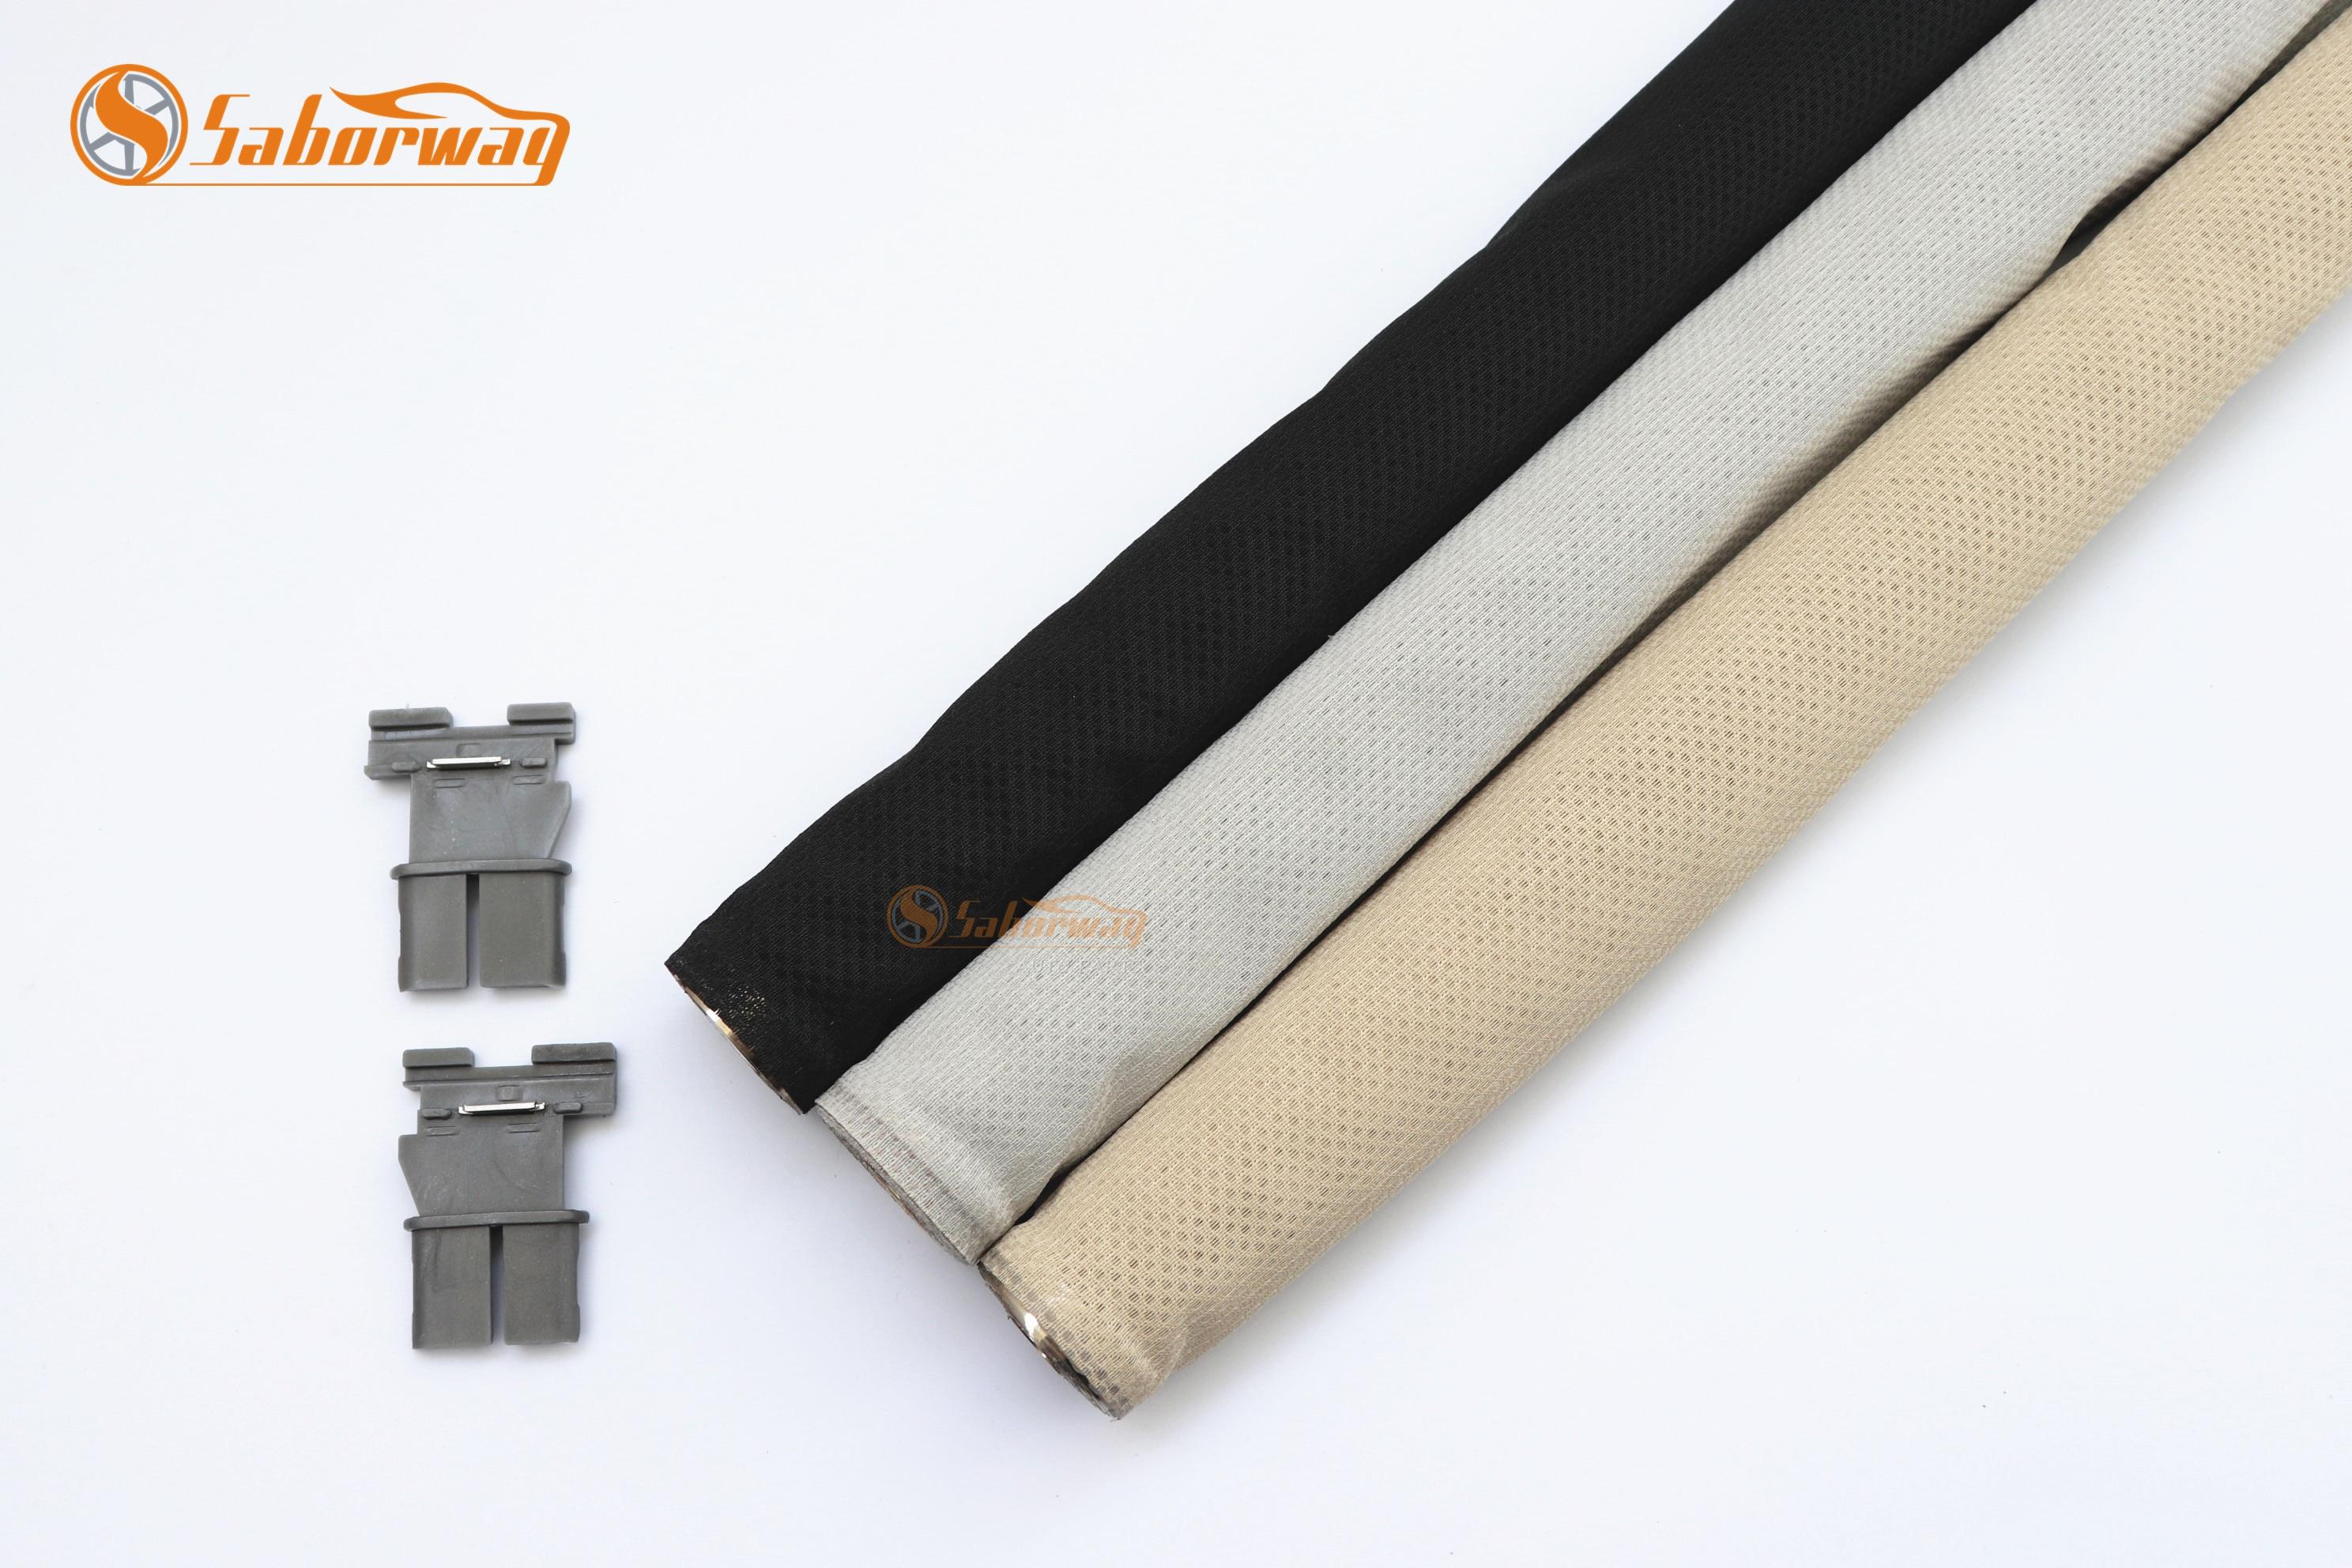 Saborway preto bege ou cinza clarabóia do obturador do pára-sol cortina para q5 sharan novo estilo tiguan 1k9877307a 5nd877307